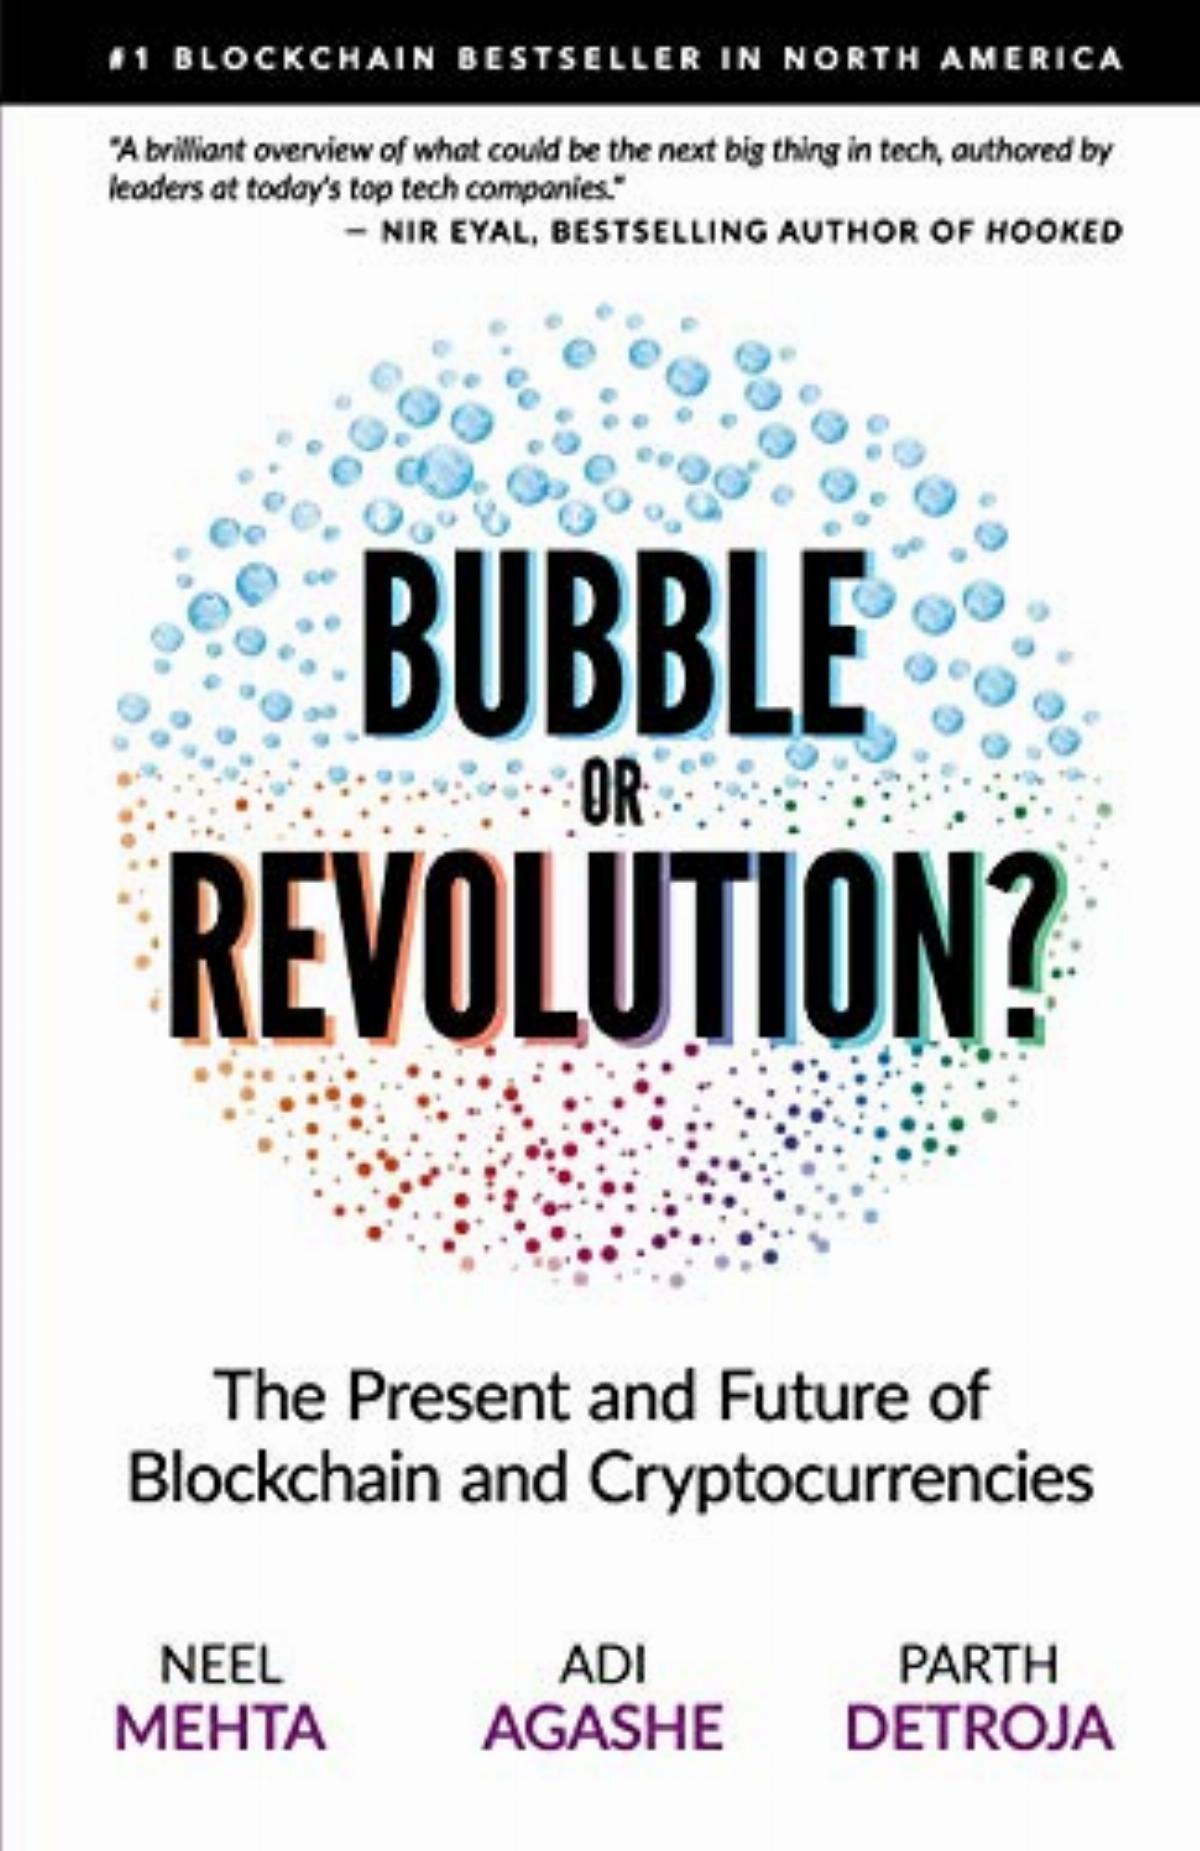 Neel Mehta, Aditya Agashe, Parth Detroja «Blockchain Bubble or Revolution: The Future of Bitcoin, Blockchains, and Cryptocurrencies»